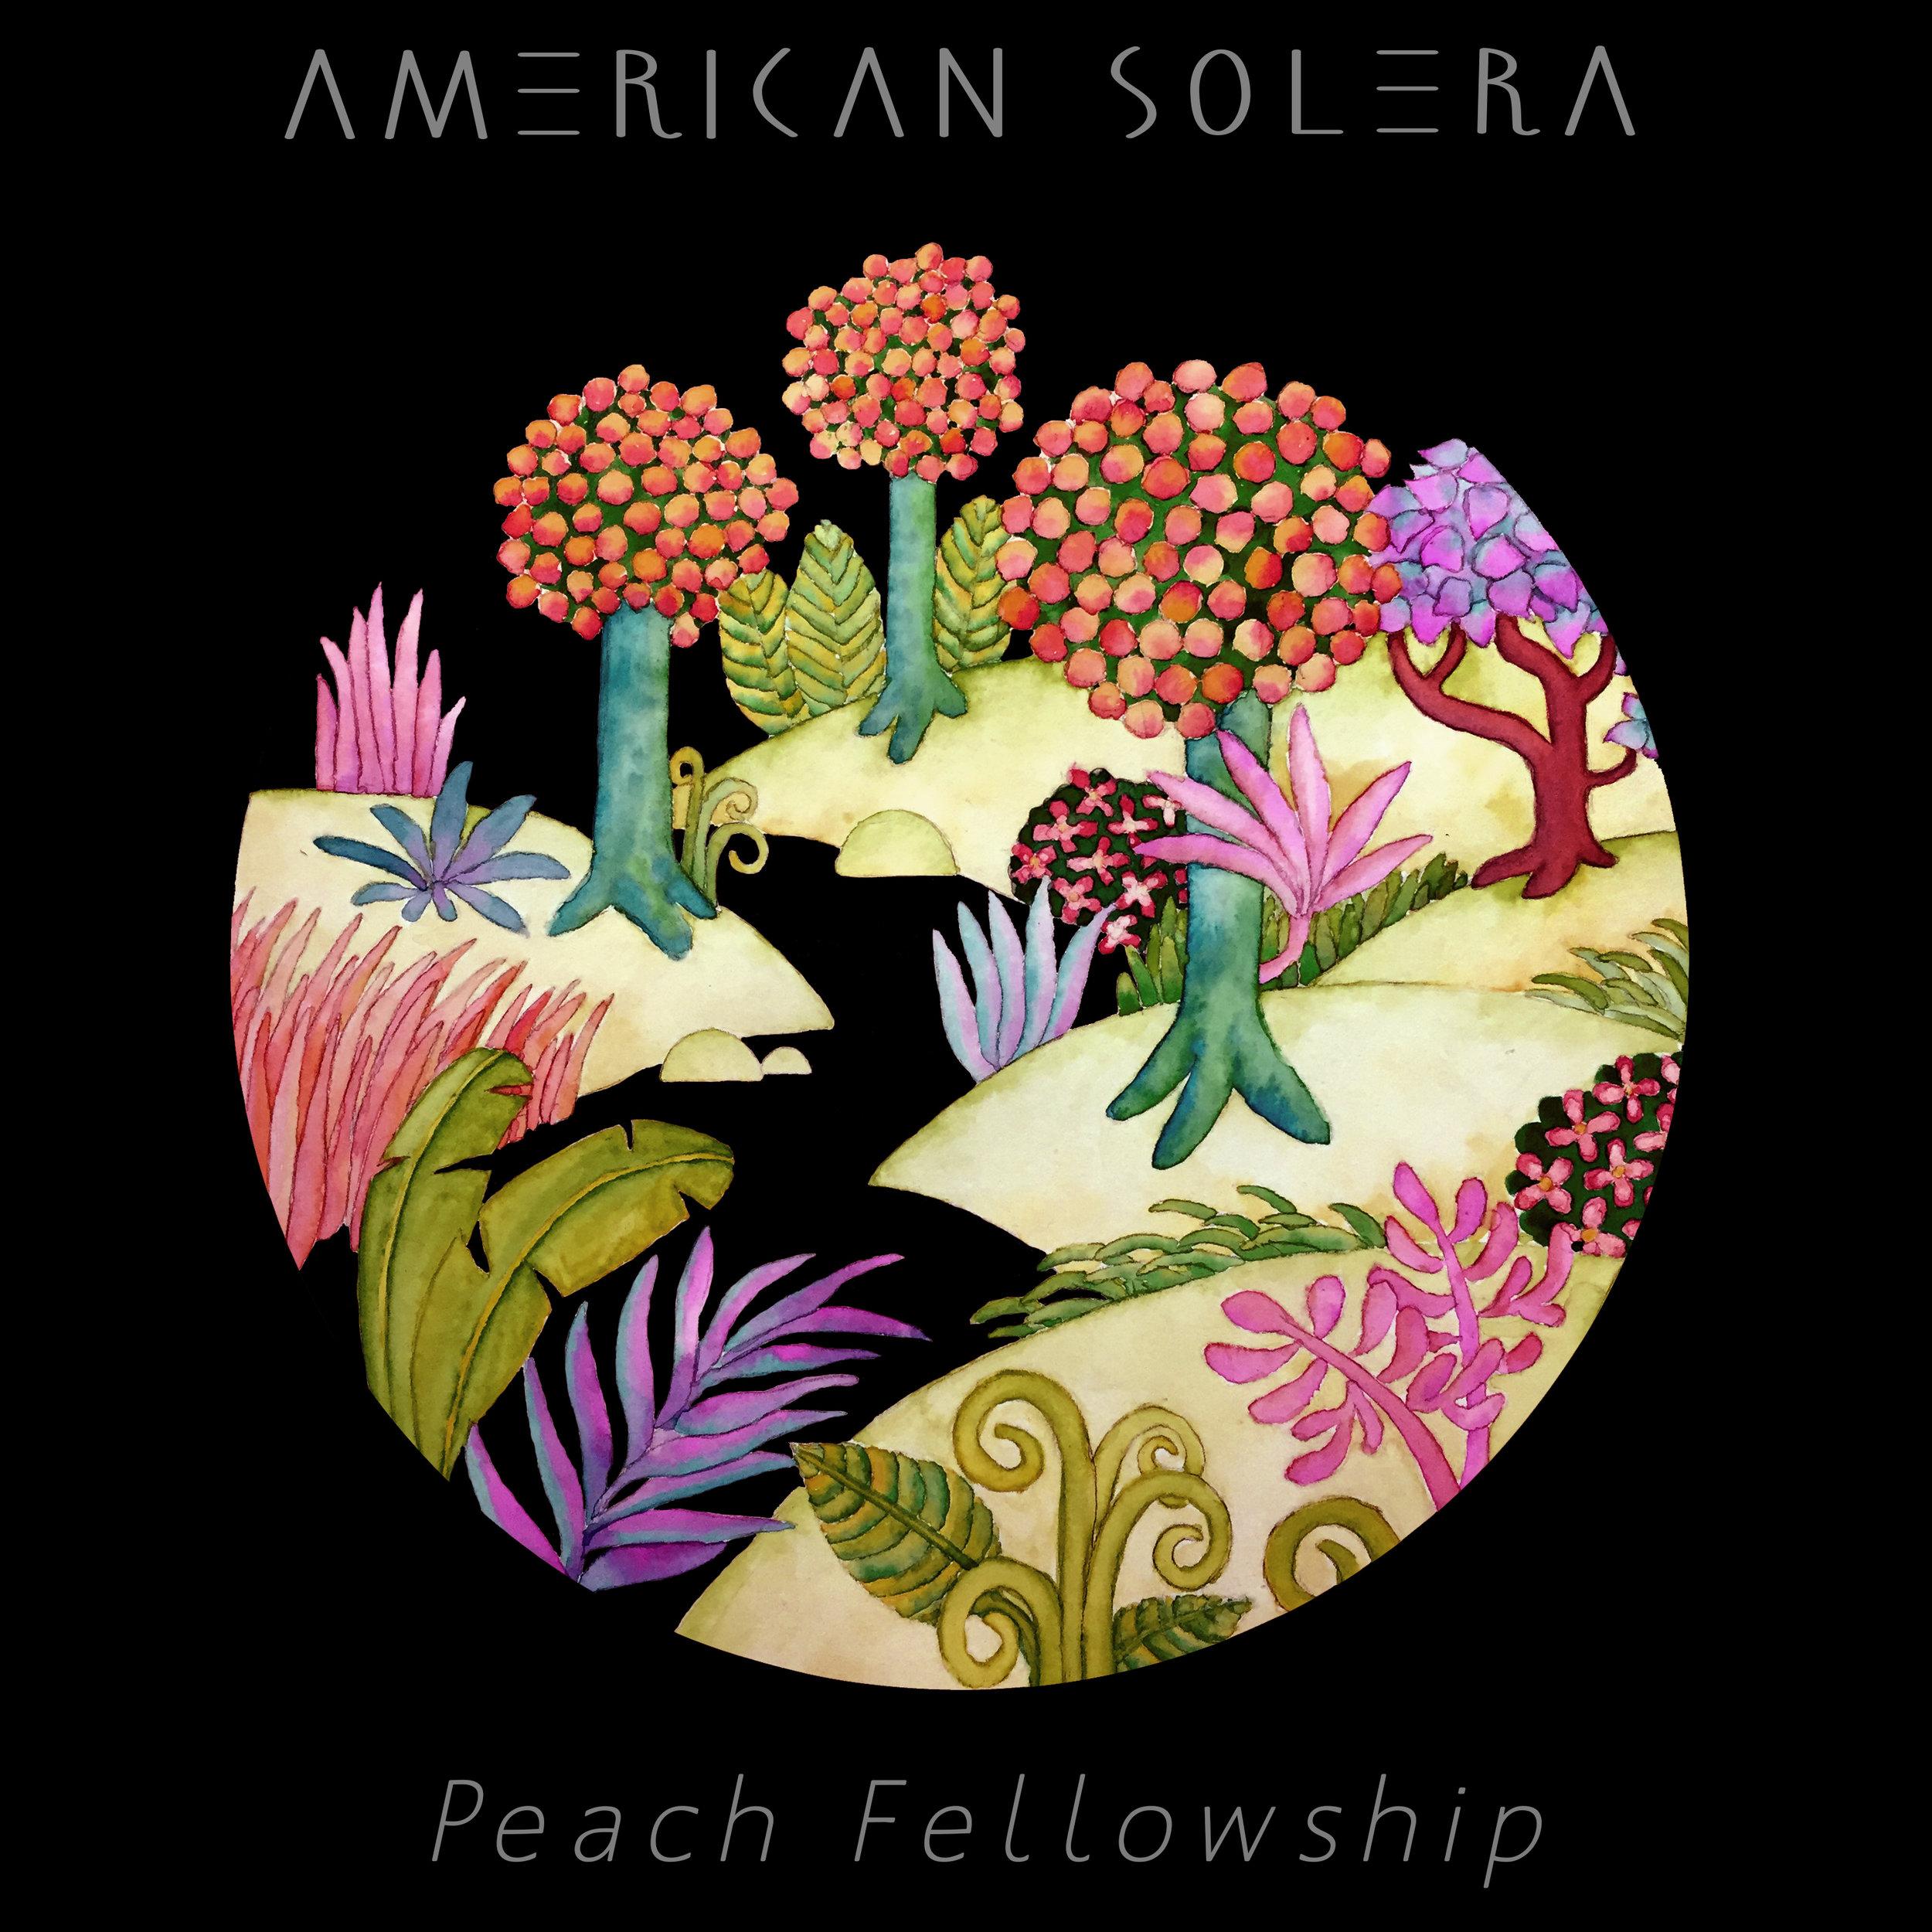 Peach fellowship FRONT v6.jpg